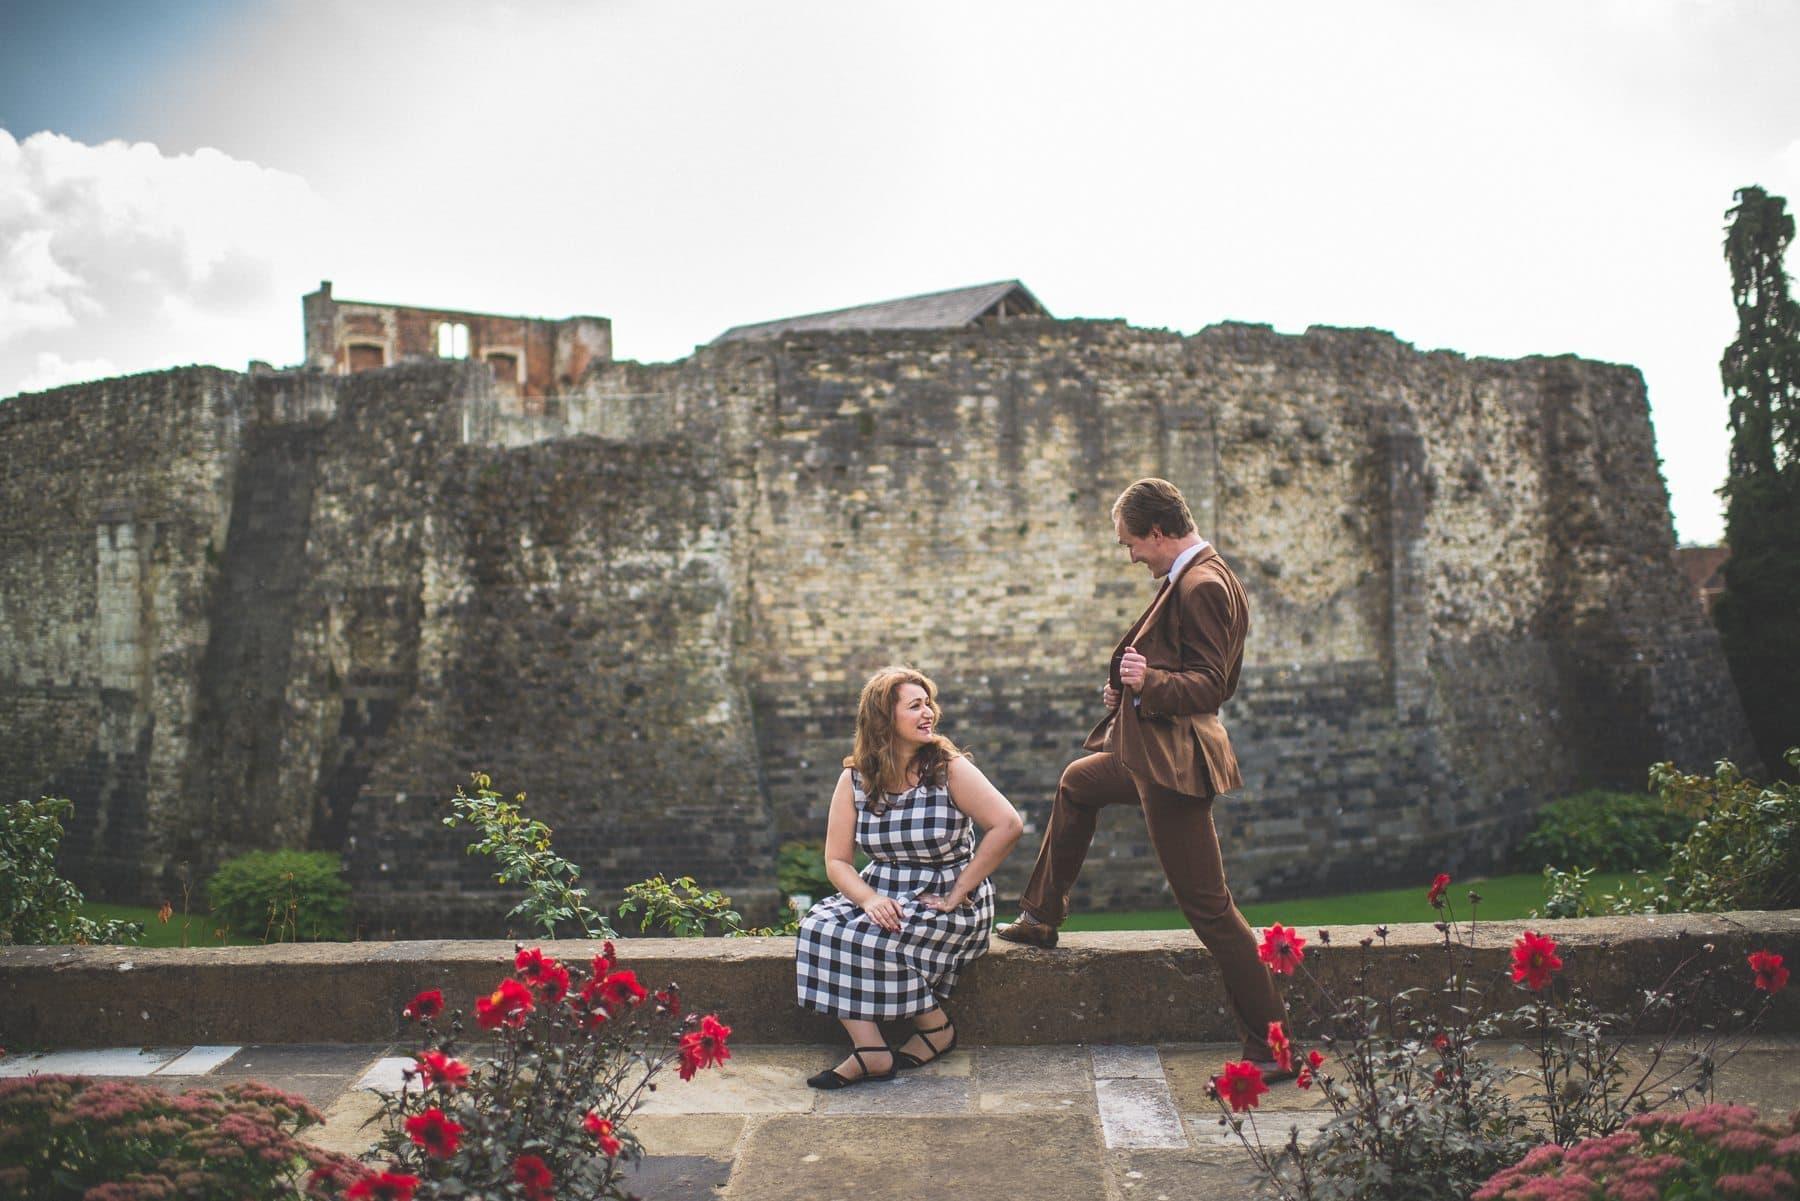 Couple goofing around at Farnham Castle Keep